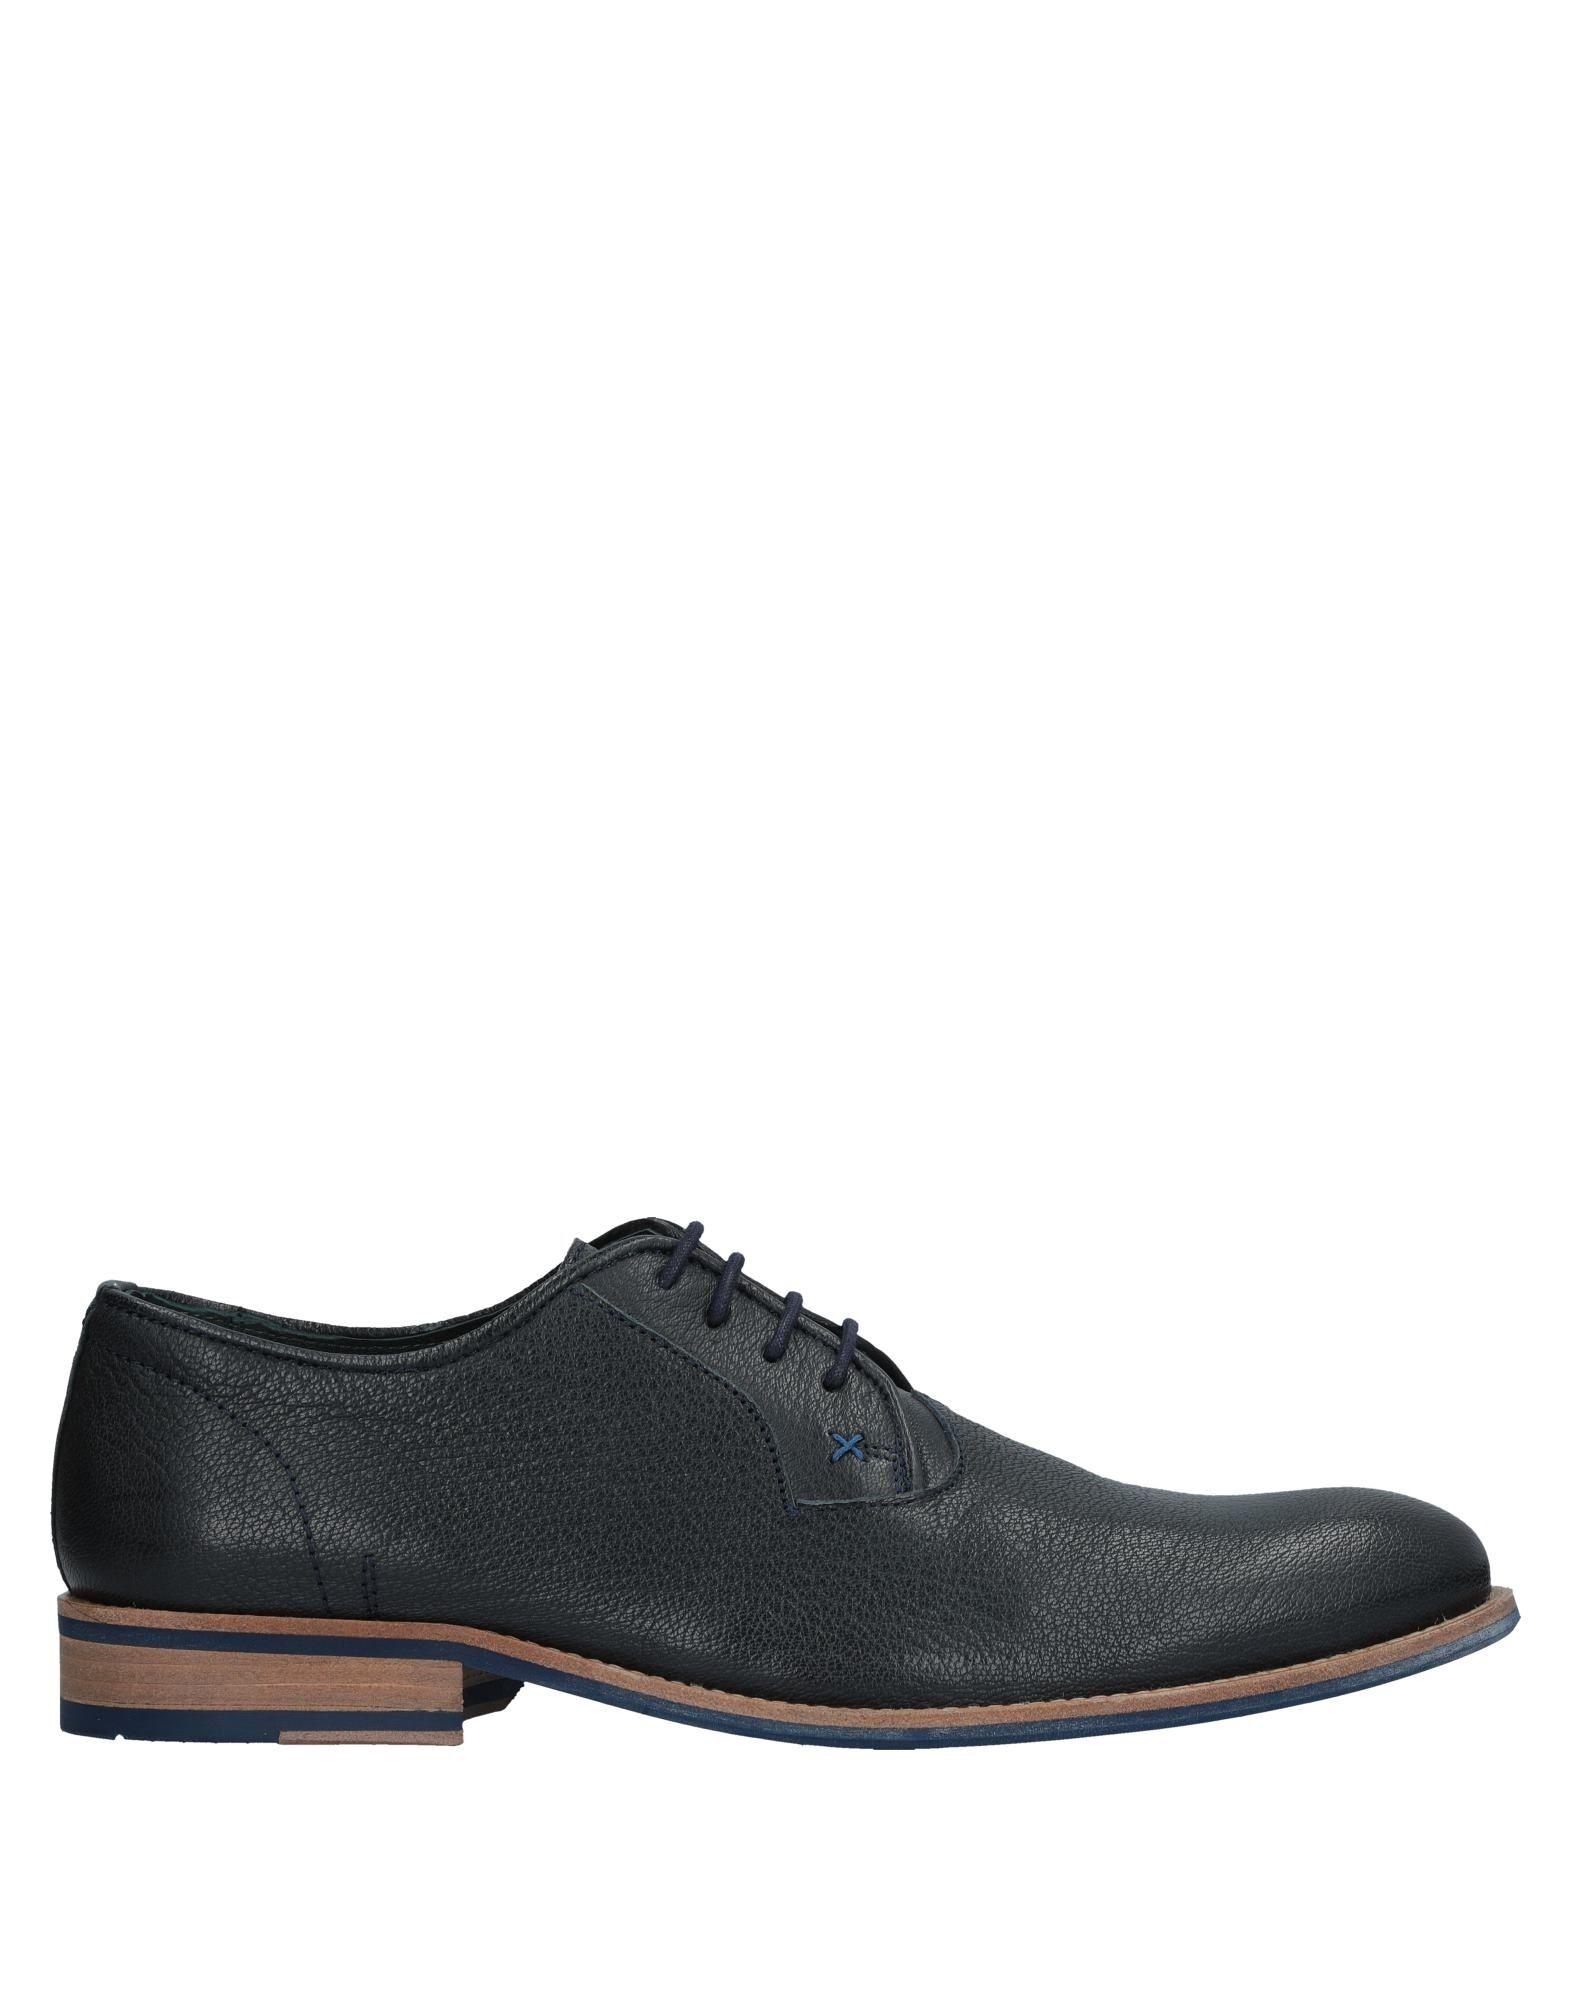 Rabatt echte Schuhe Exceed Schnürschuhe Herren  11521576OI